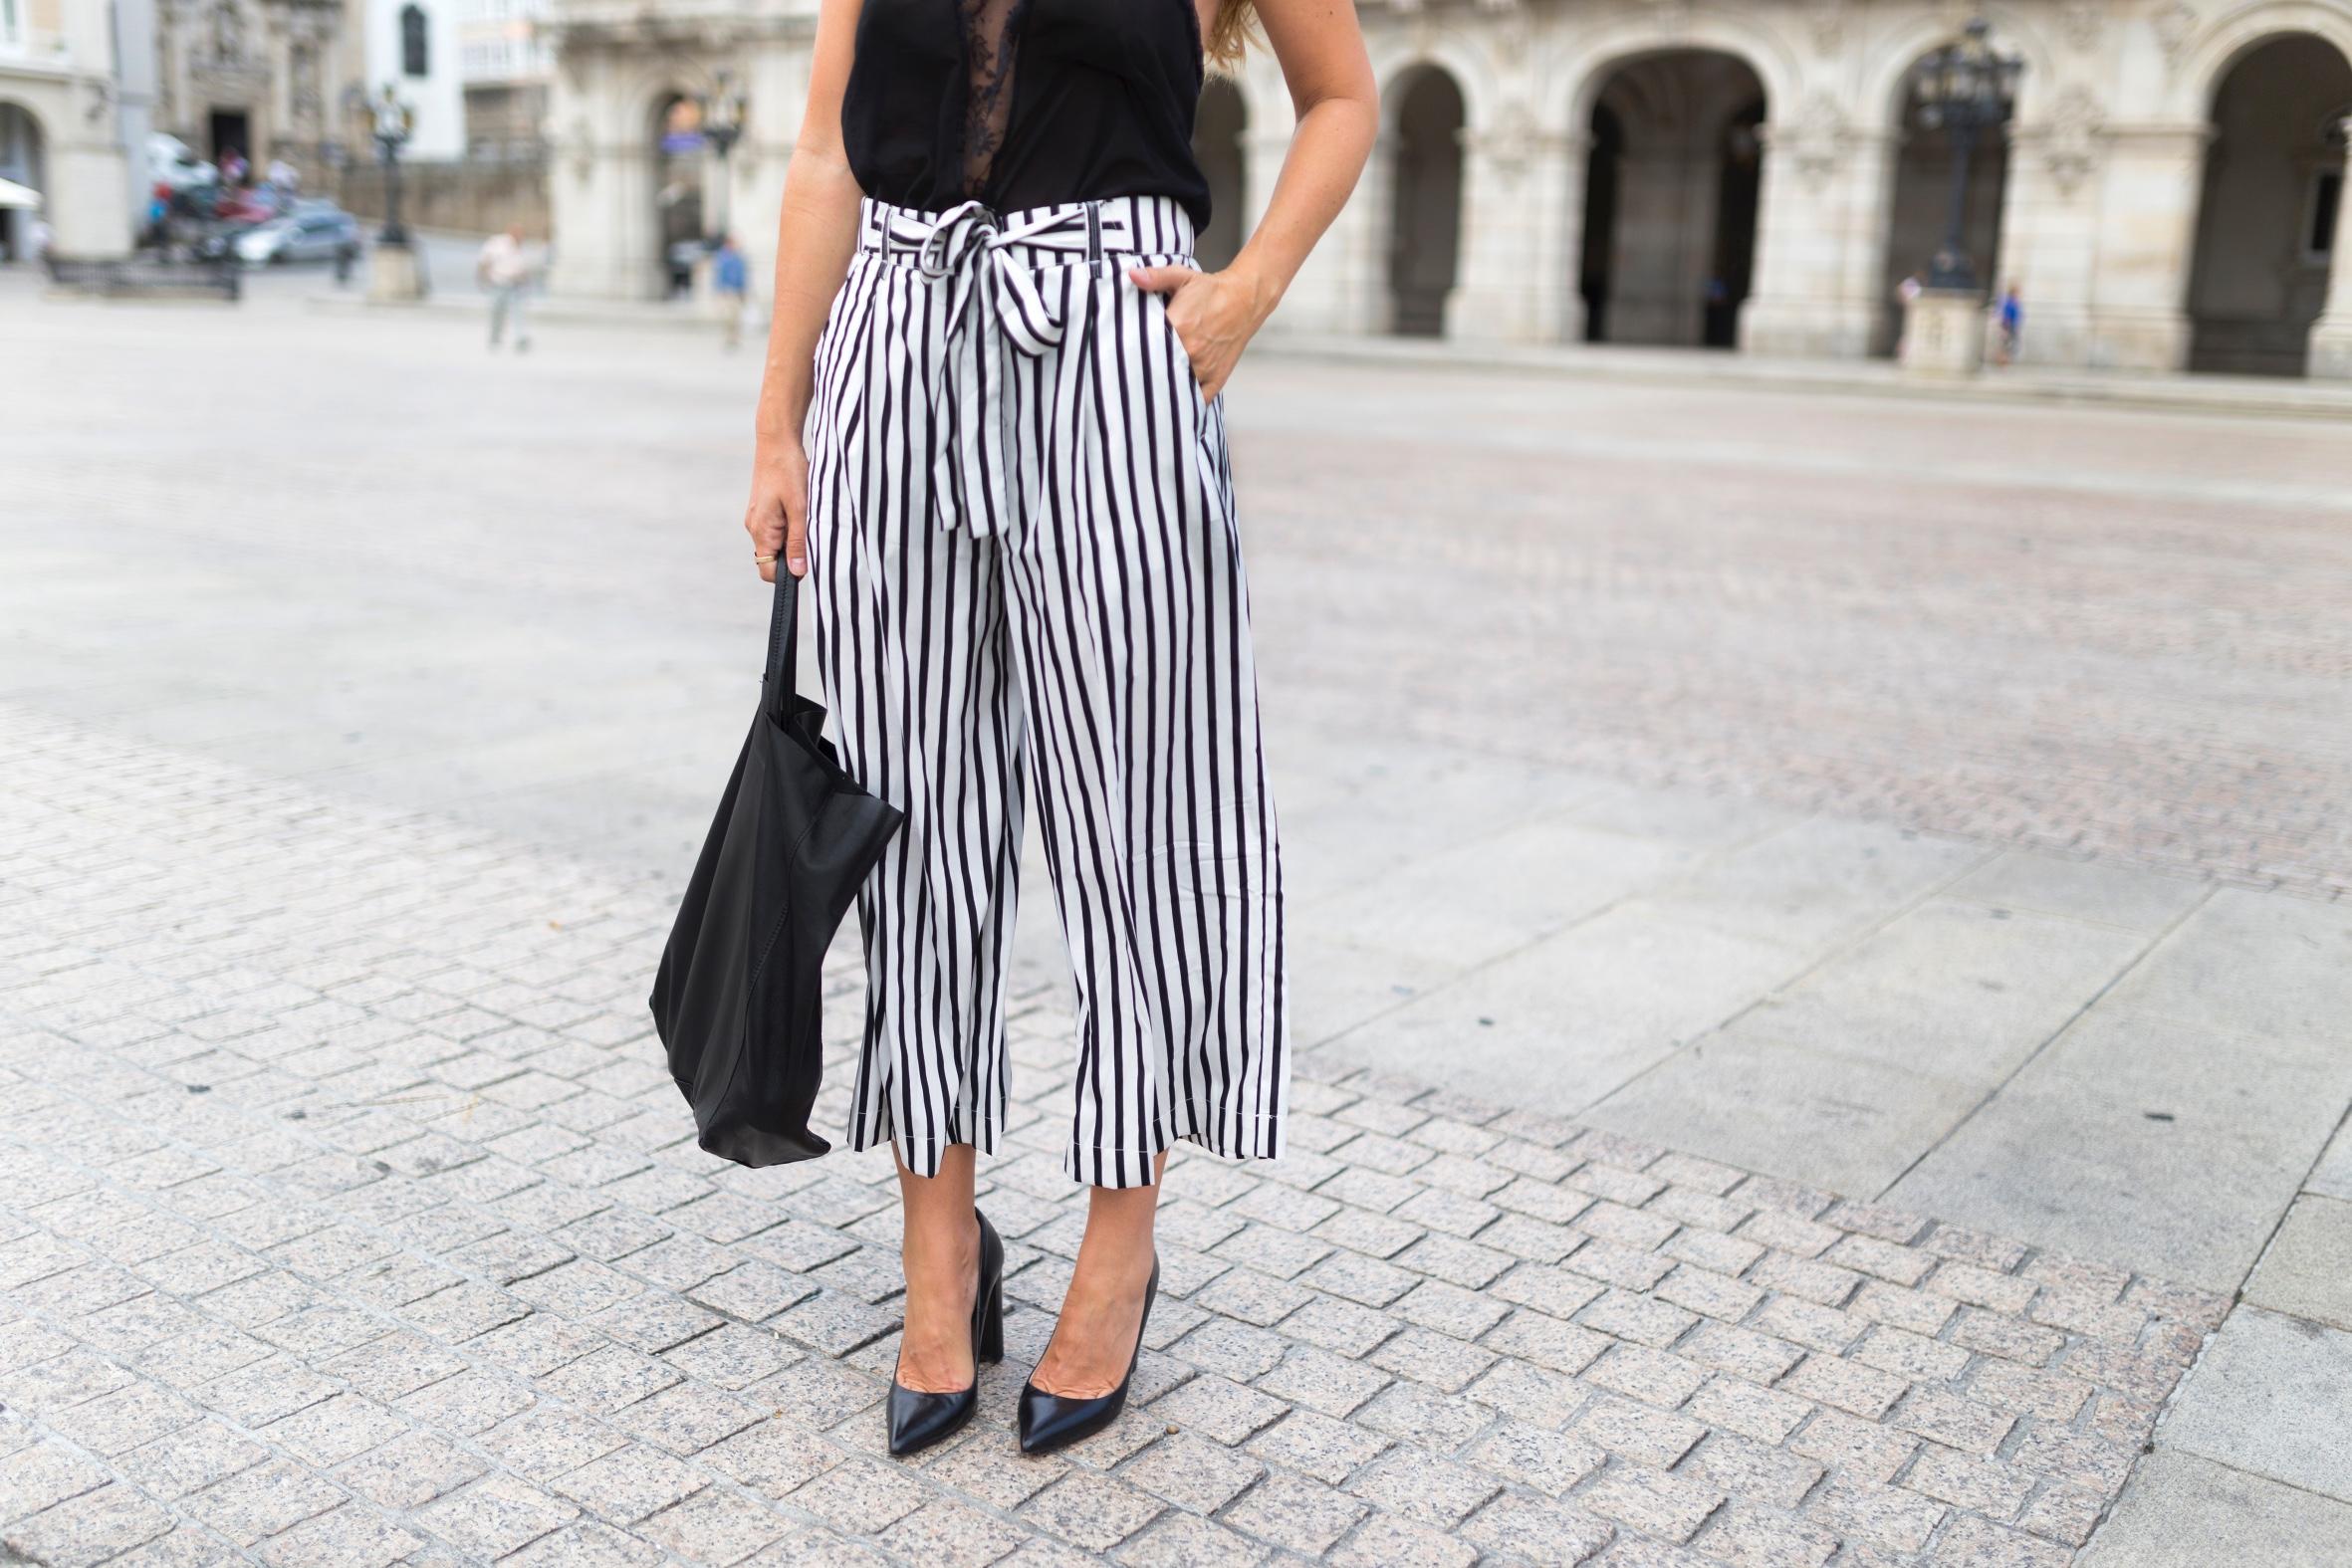 pantalones rayas-ZARA-Cèline-tote bag-volver a la rutina- Passionata- lencería- mono lencero- streetstyle- coruña- Céline bag- blogger-passionatagirls